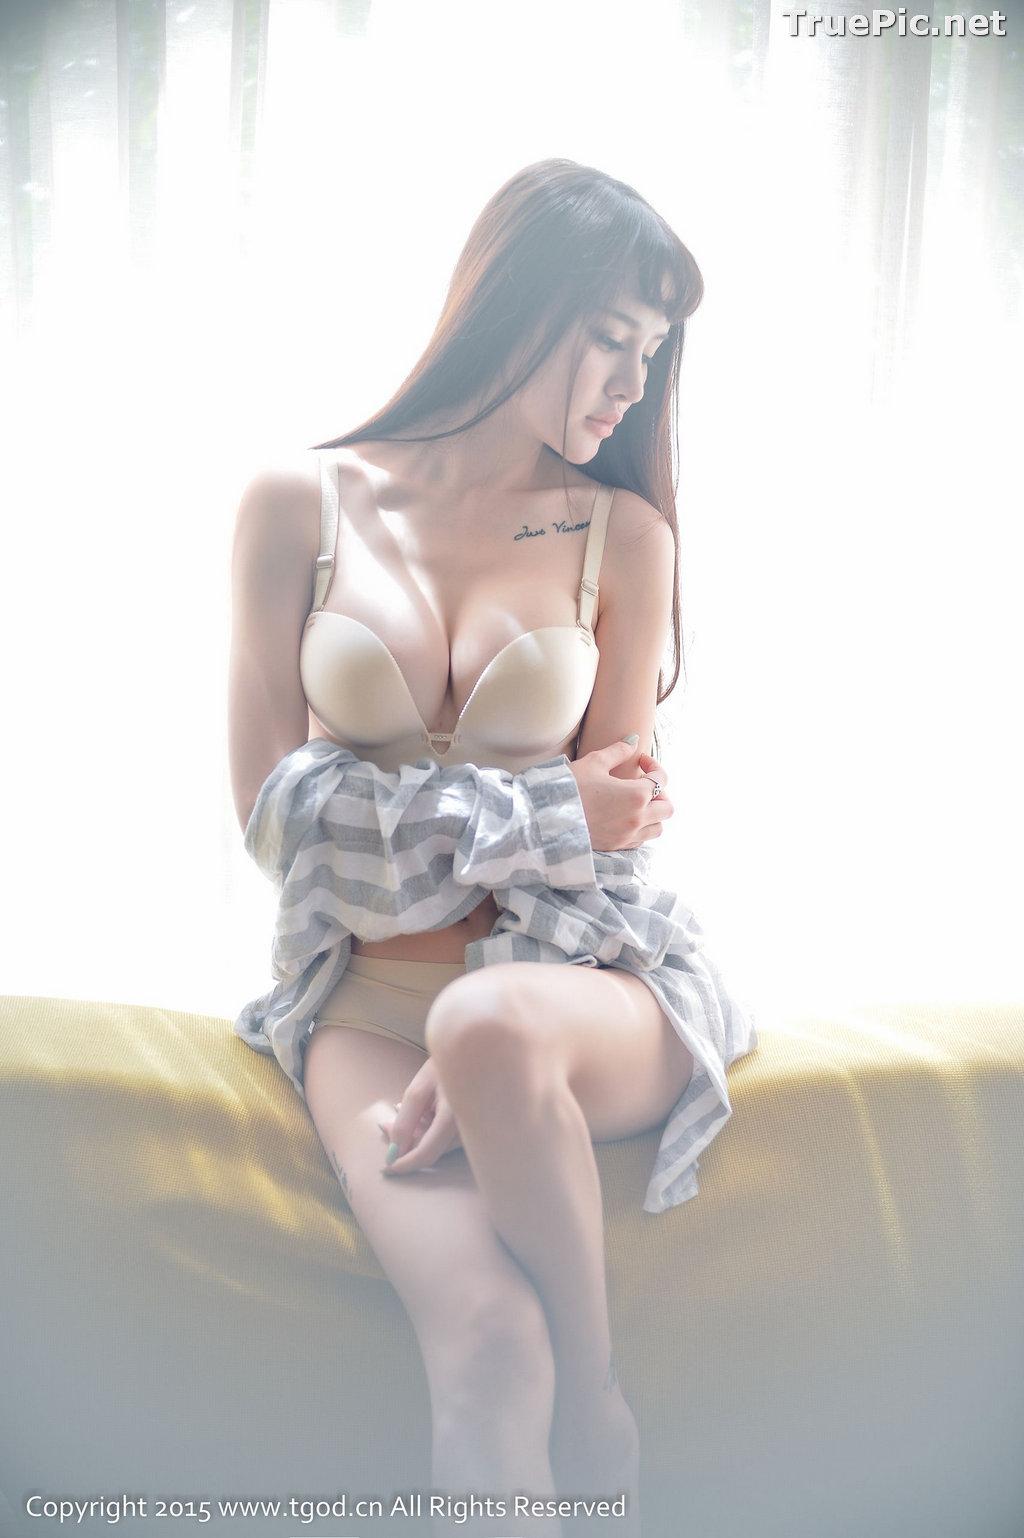 Image TGOD 2015-11-10 - Chinese Sexy Model - Cheryl (青树) - TruePic.net - Picture-4